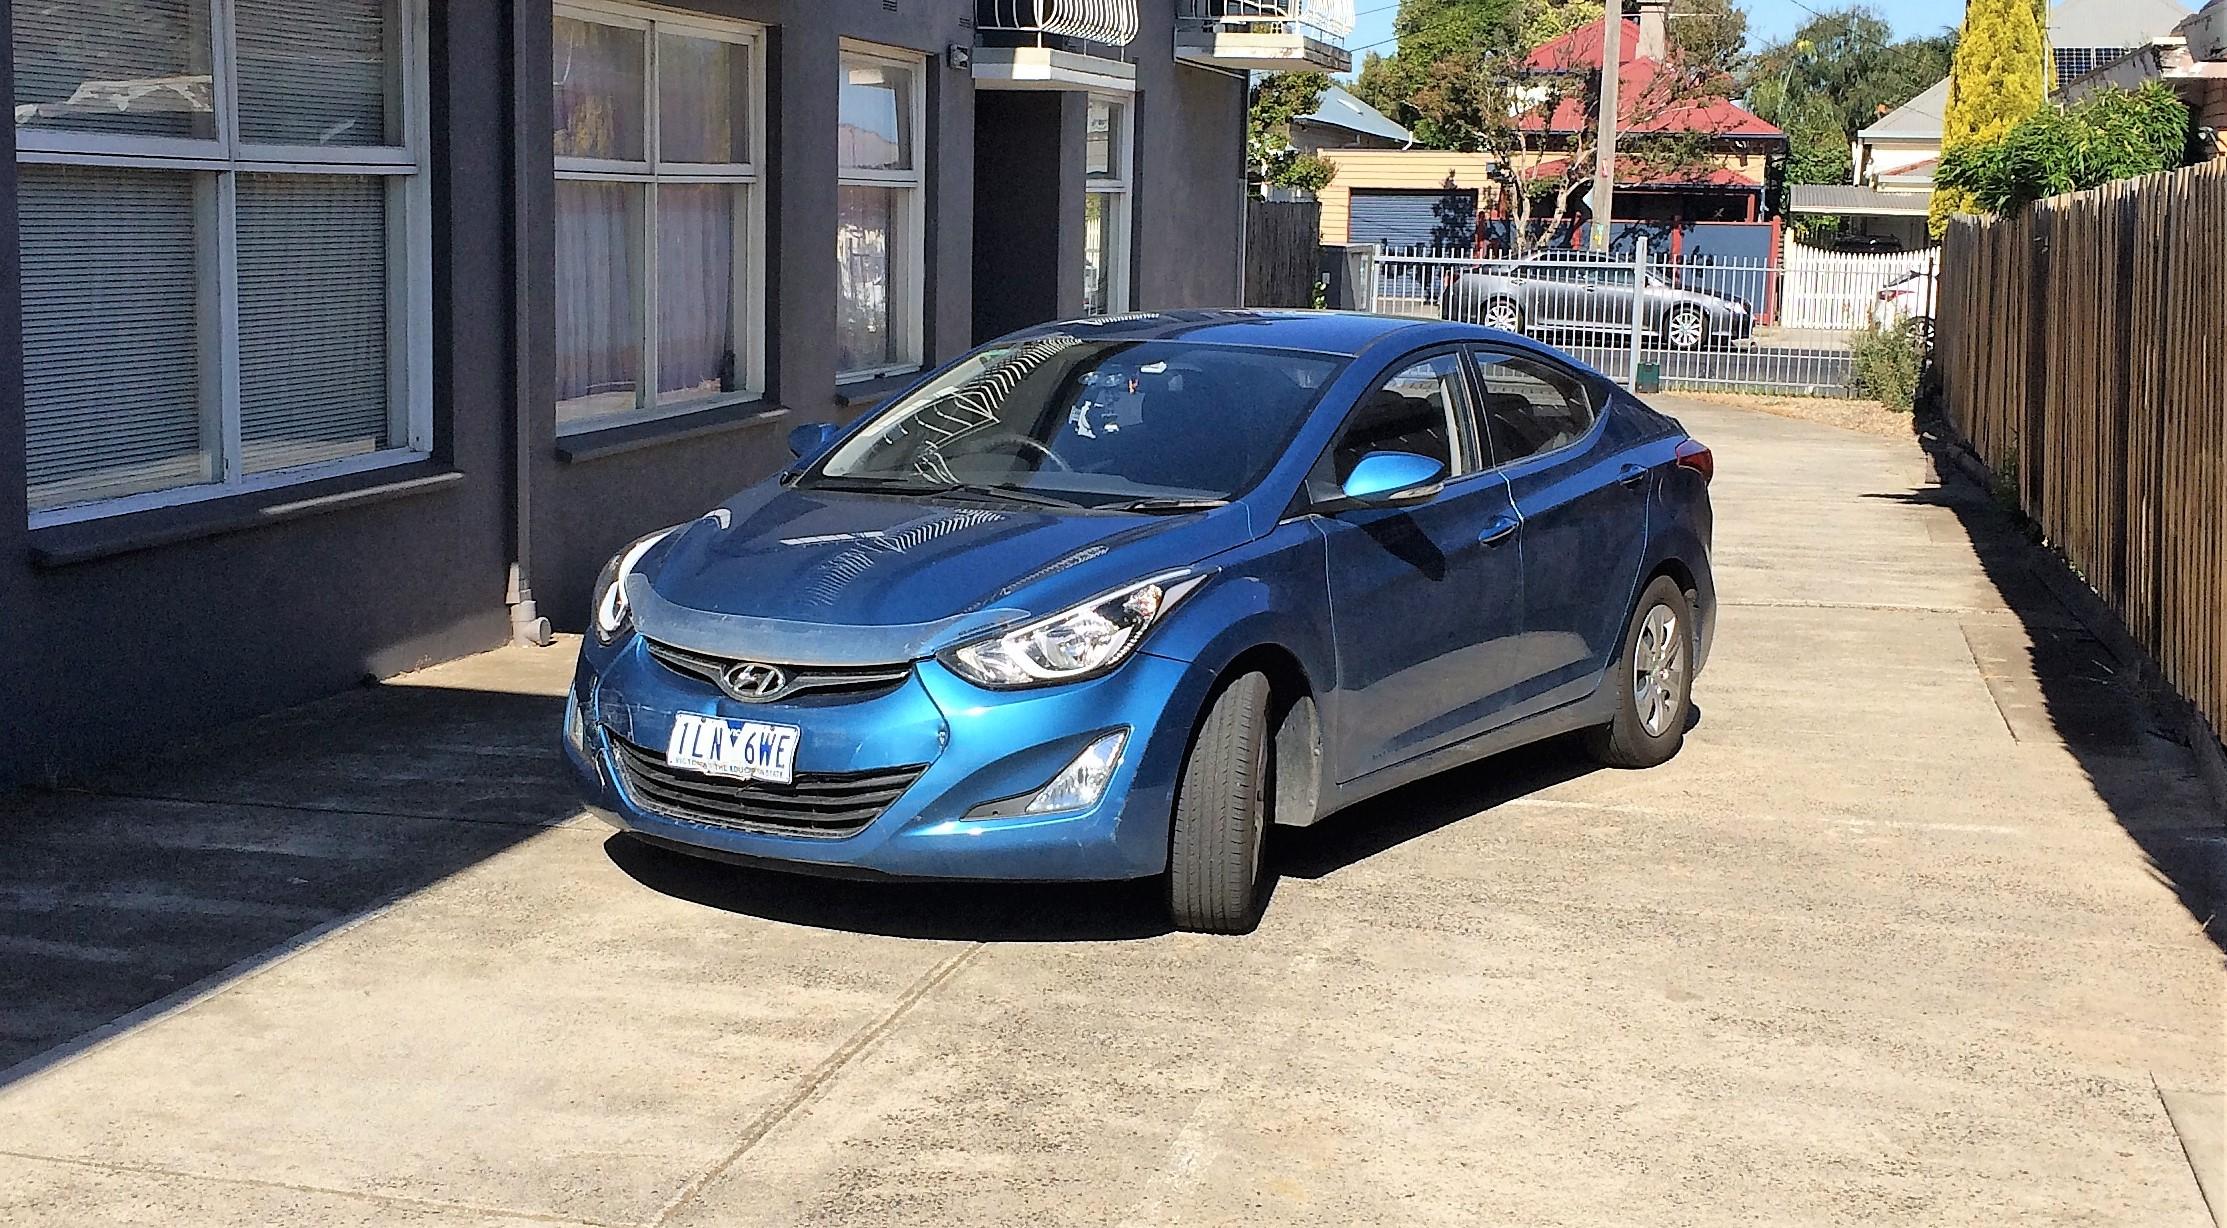 Picture of Vijay's 2014 Hyundai Elantra